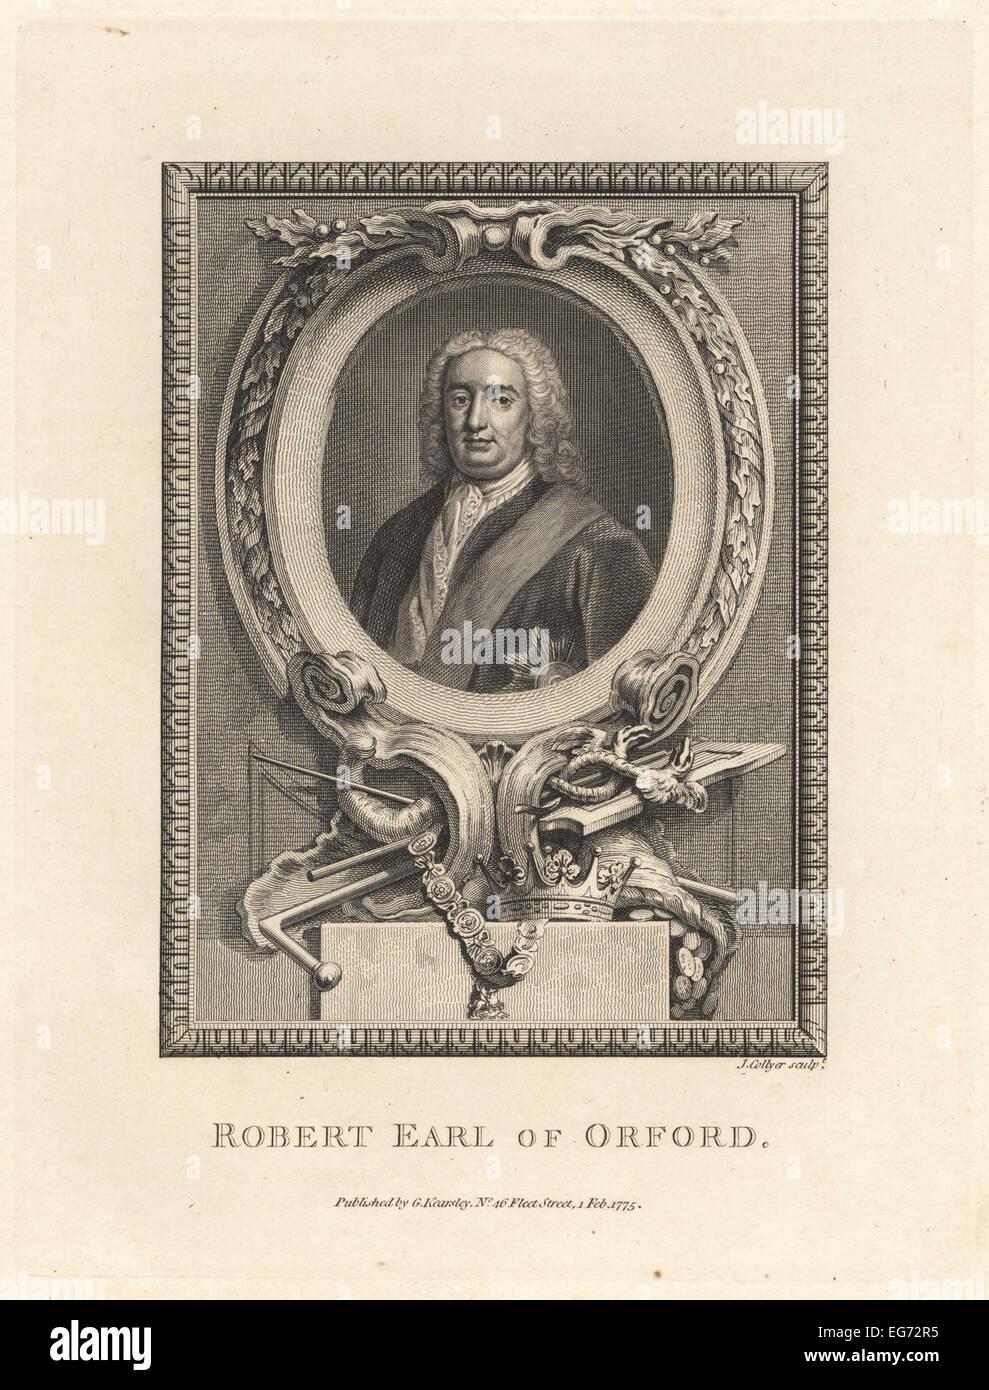 Sir Robert Walpole, 1st Earl of Orford, British statesman, 1676-1745. - Stock Image